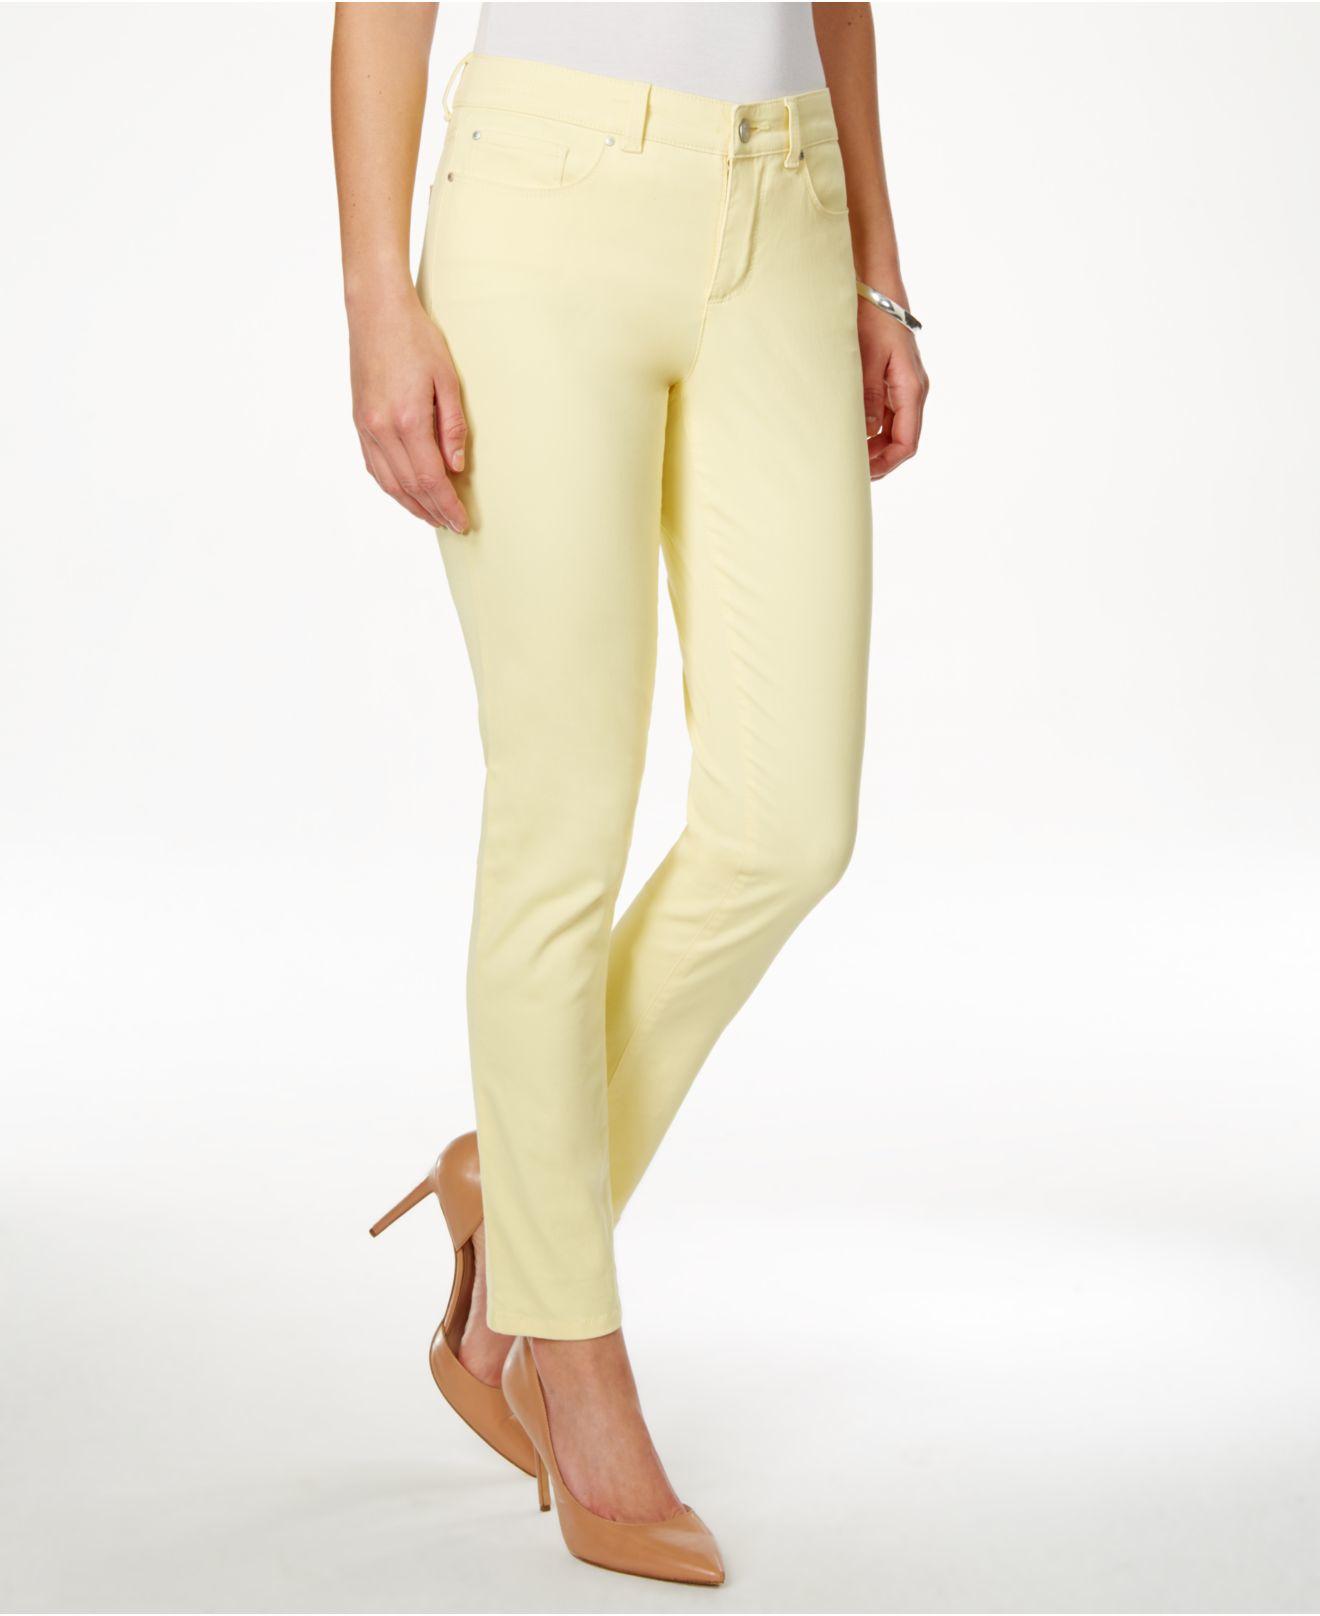 Charter Club Women/'s  Bristol Capri Lemon Tart Jeans